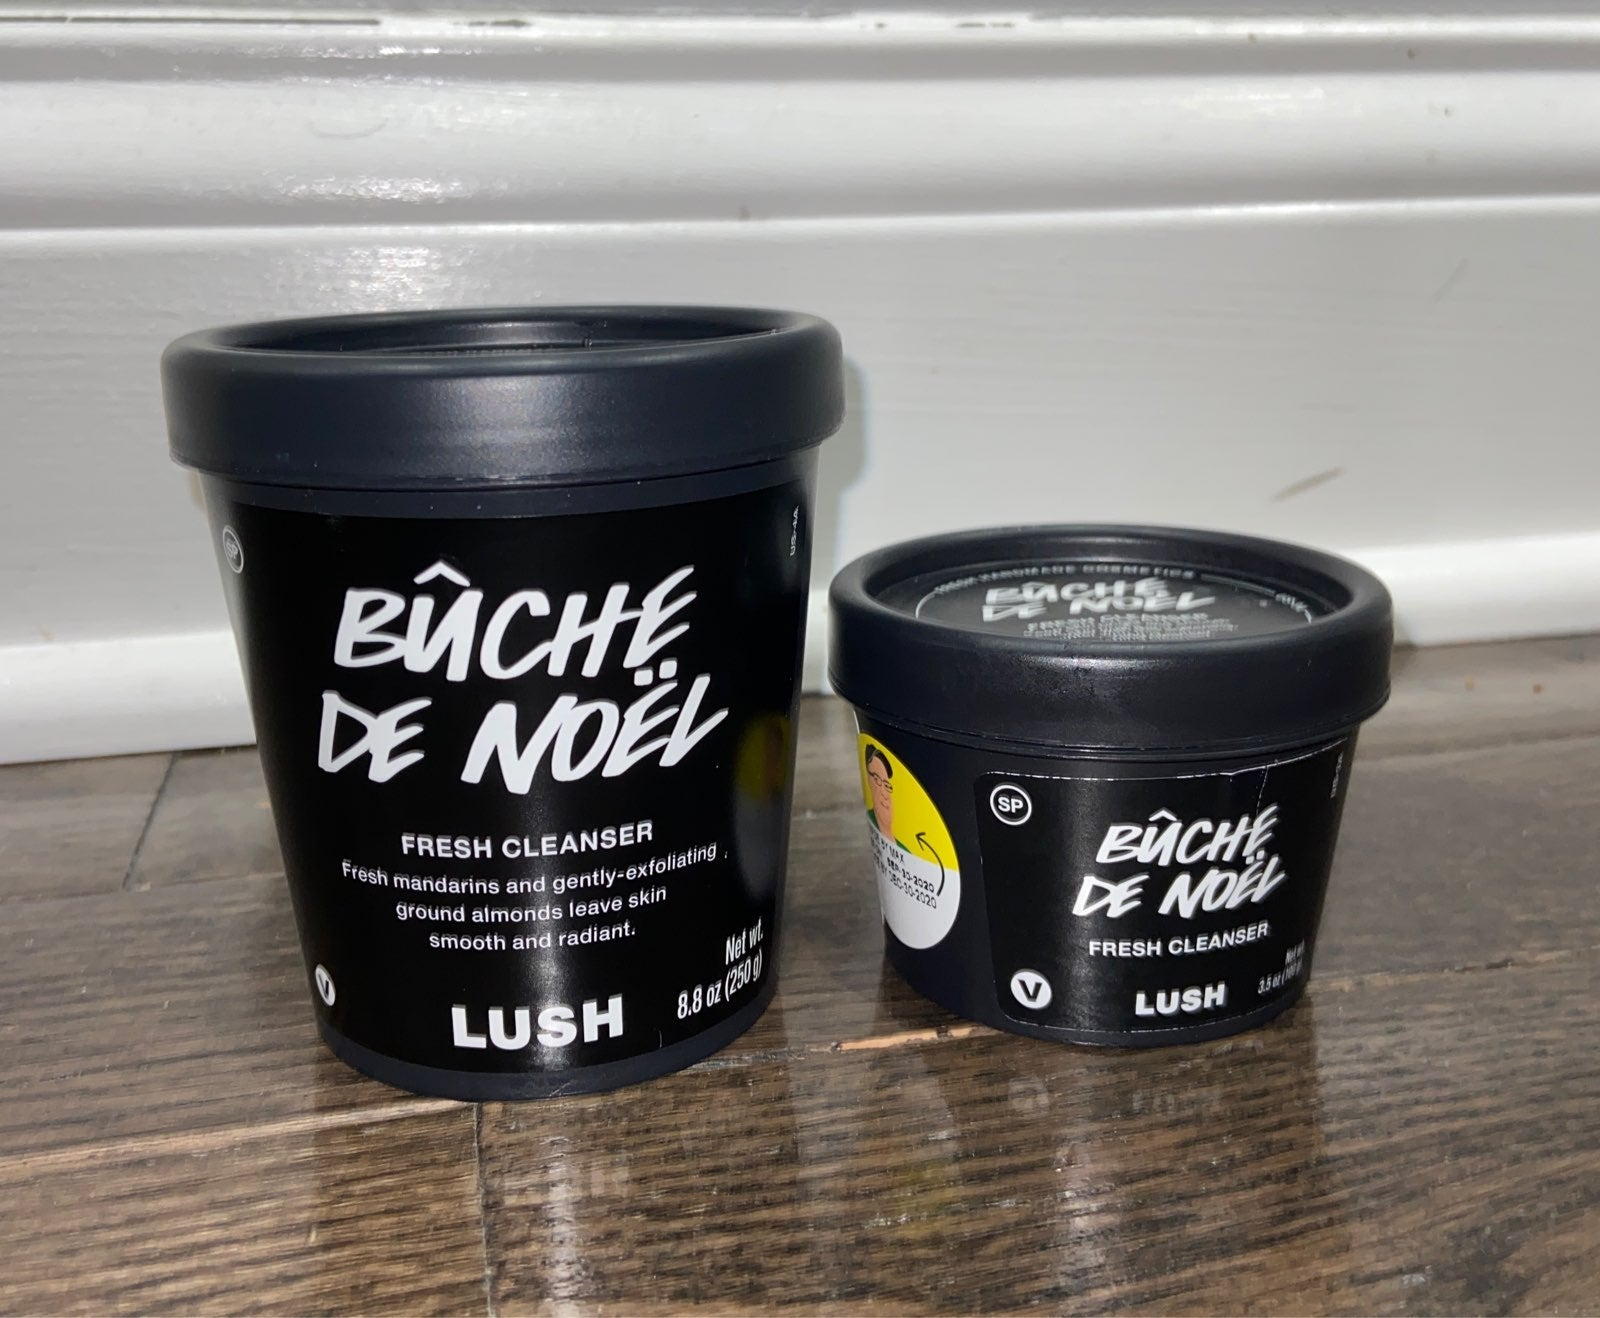 Lush Buche De Noel Cleanser